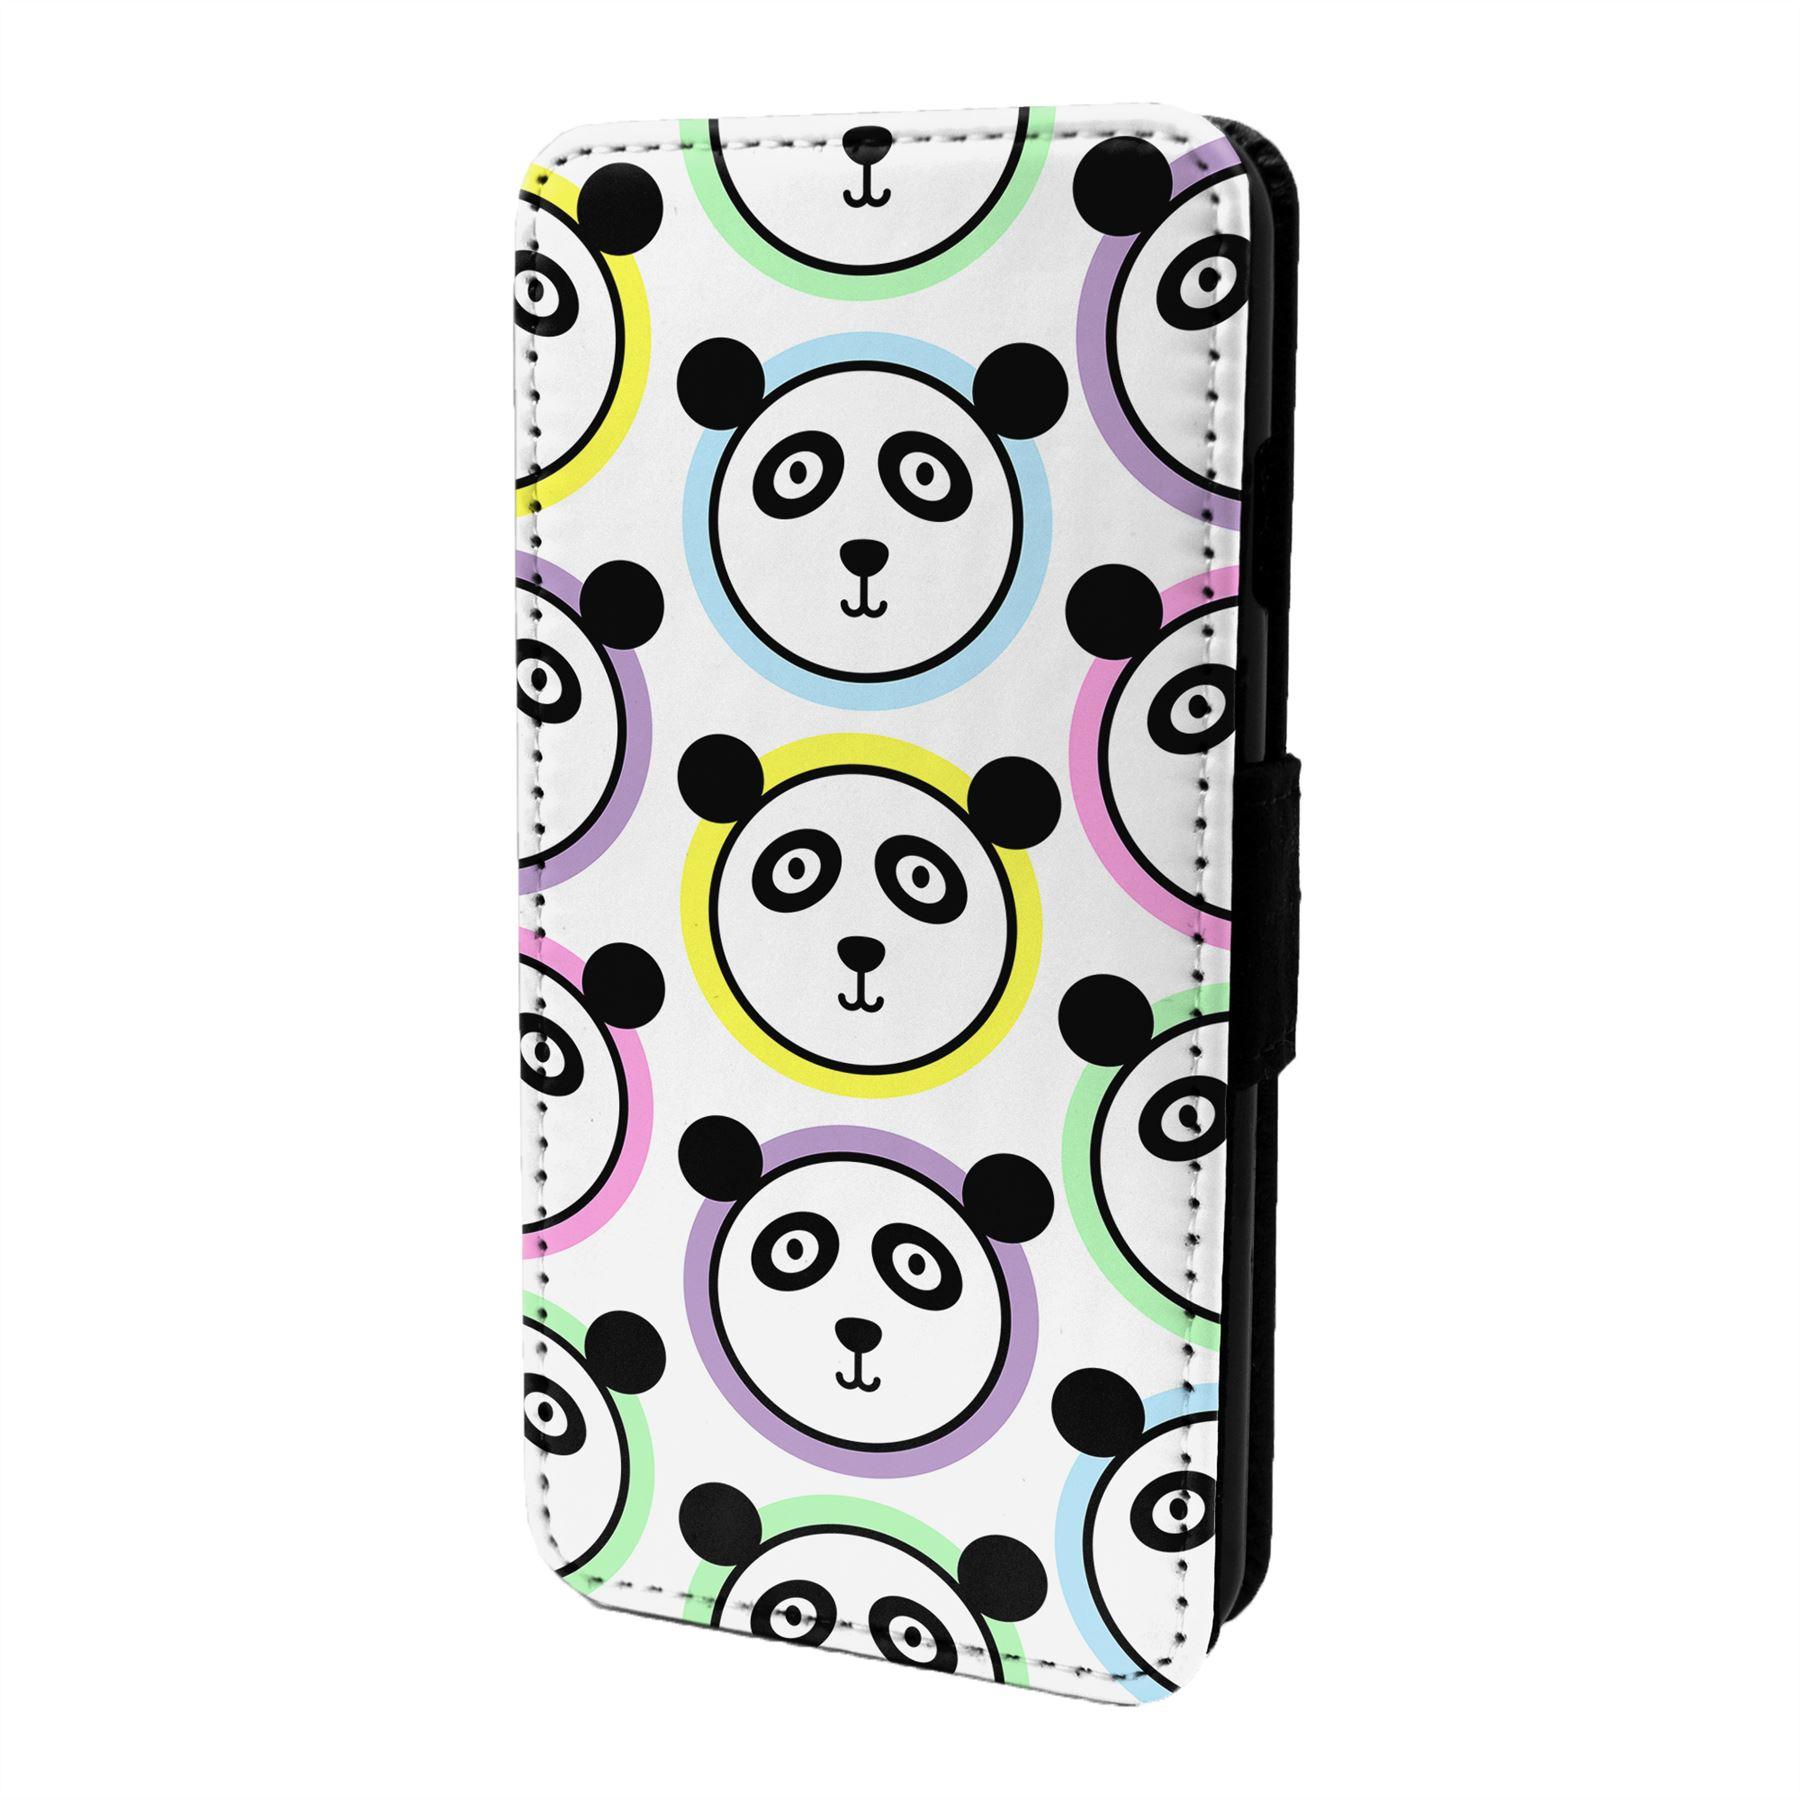 Panda-Motif-Etui-Rabattable-pour-Telephone-Portable-S7009